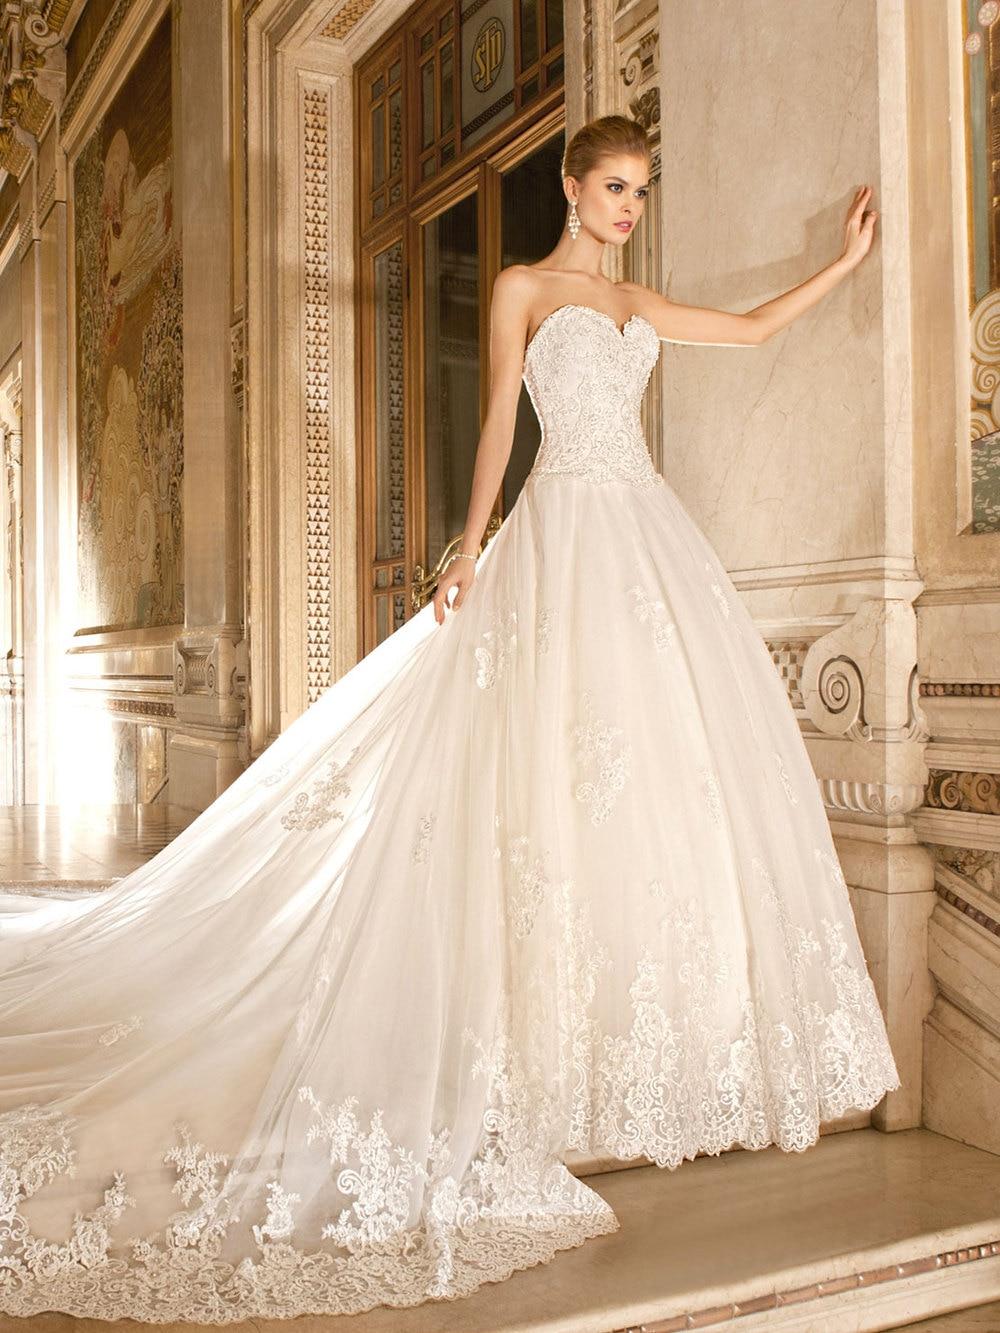 lace aline wedding dress with train